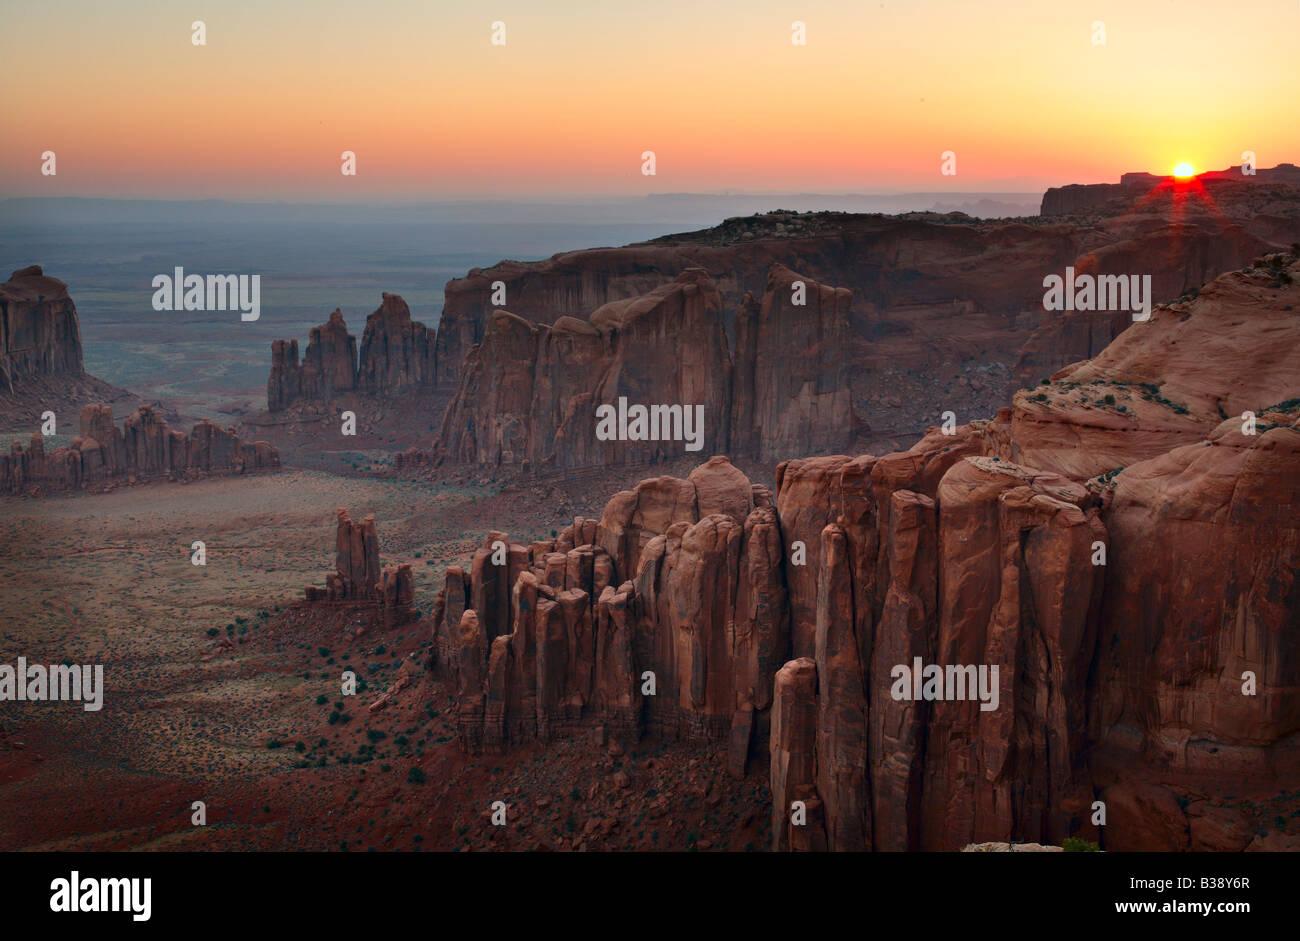 Amanecer en el extremo lejano de Hunt's Mesa arriba Monument Valley Arizona Foto de stock